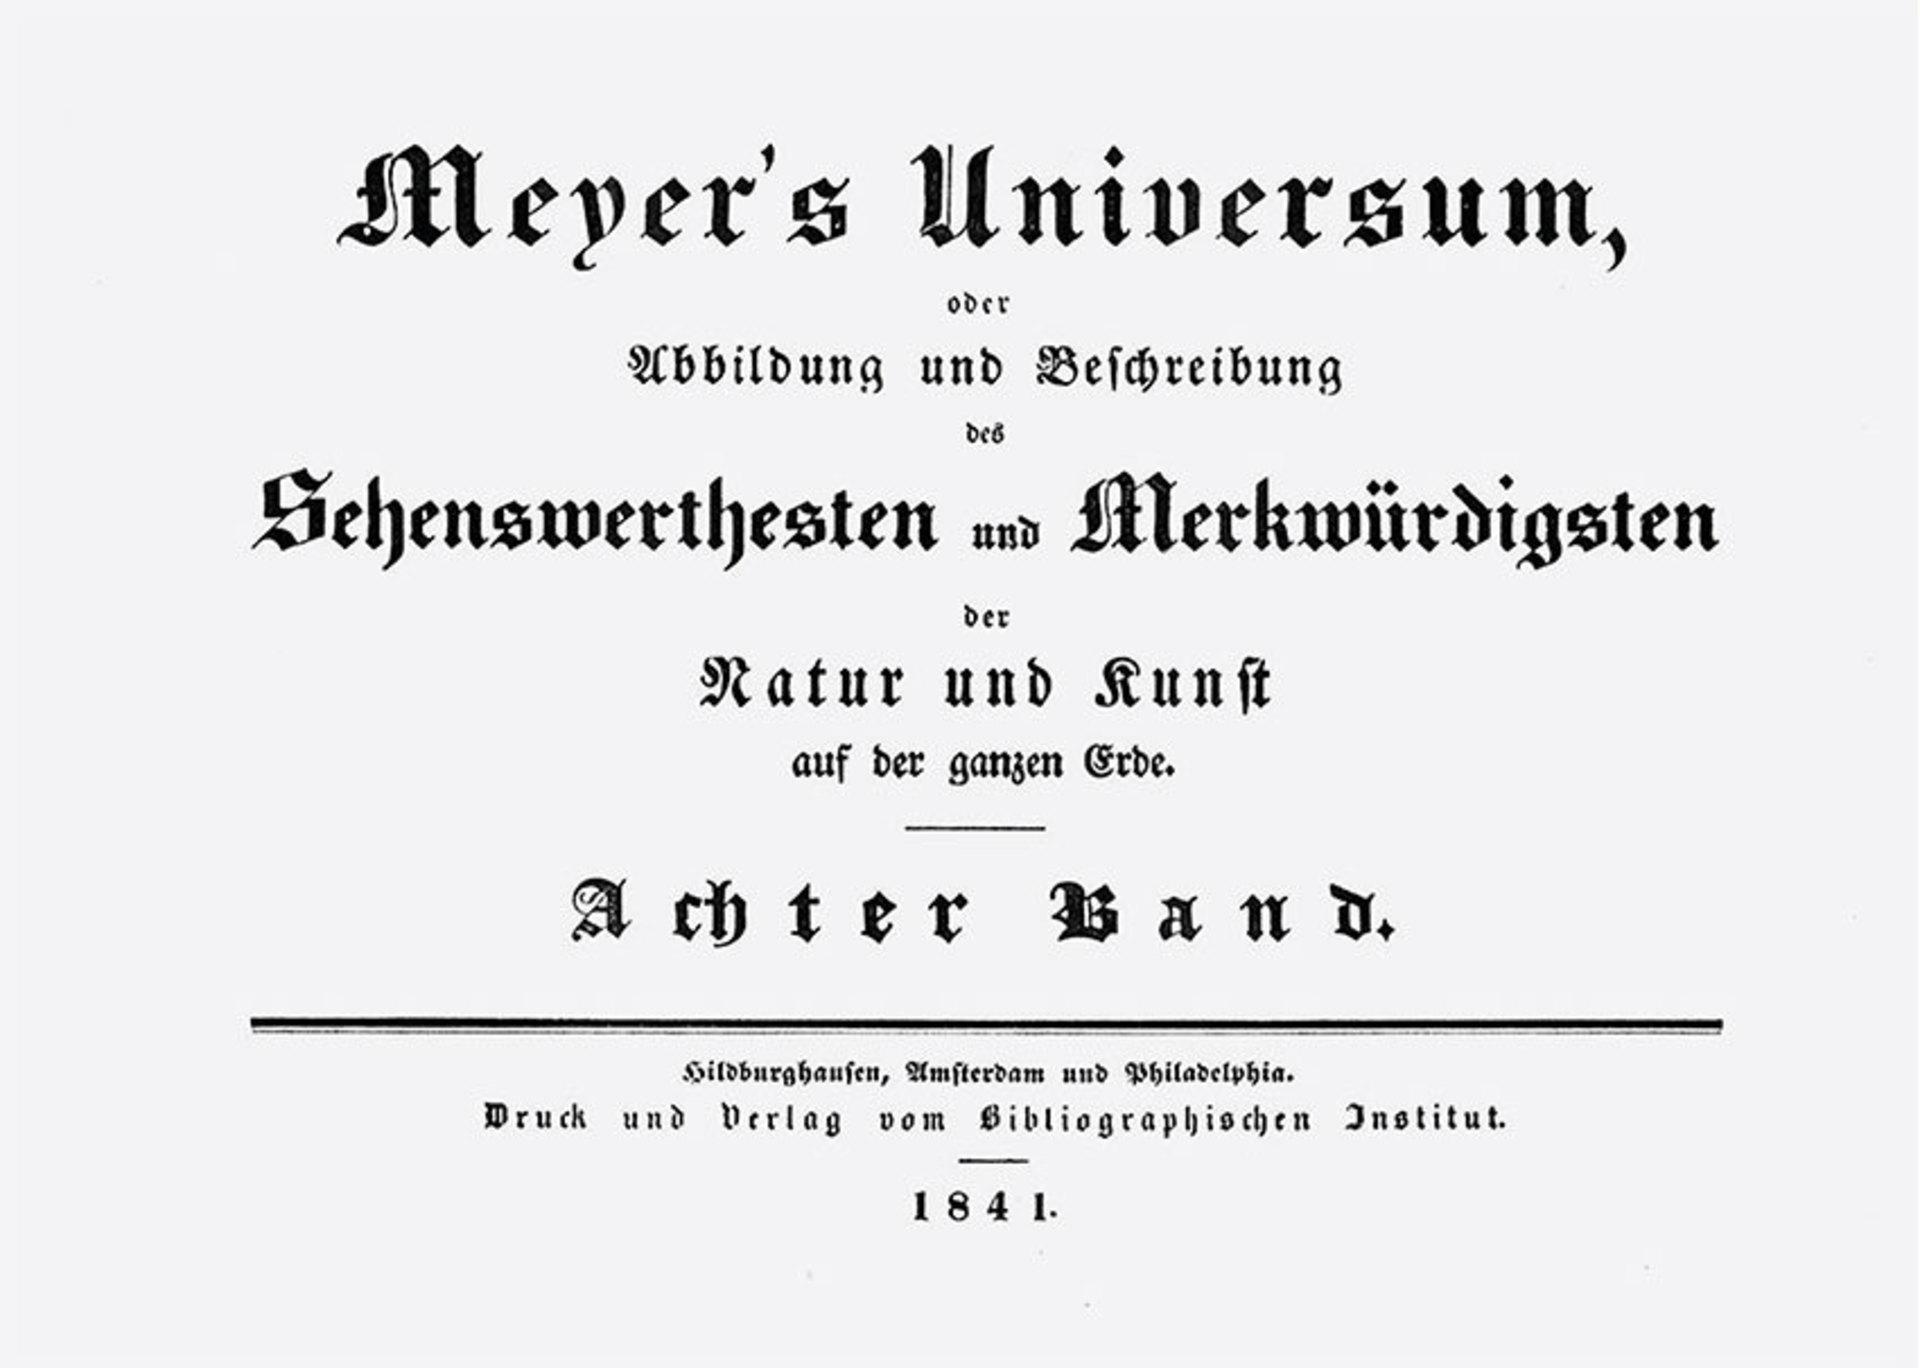 meyers-universun.jpg